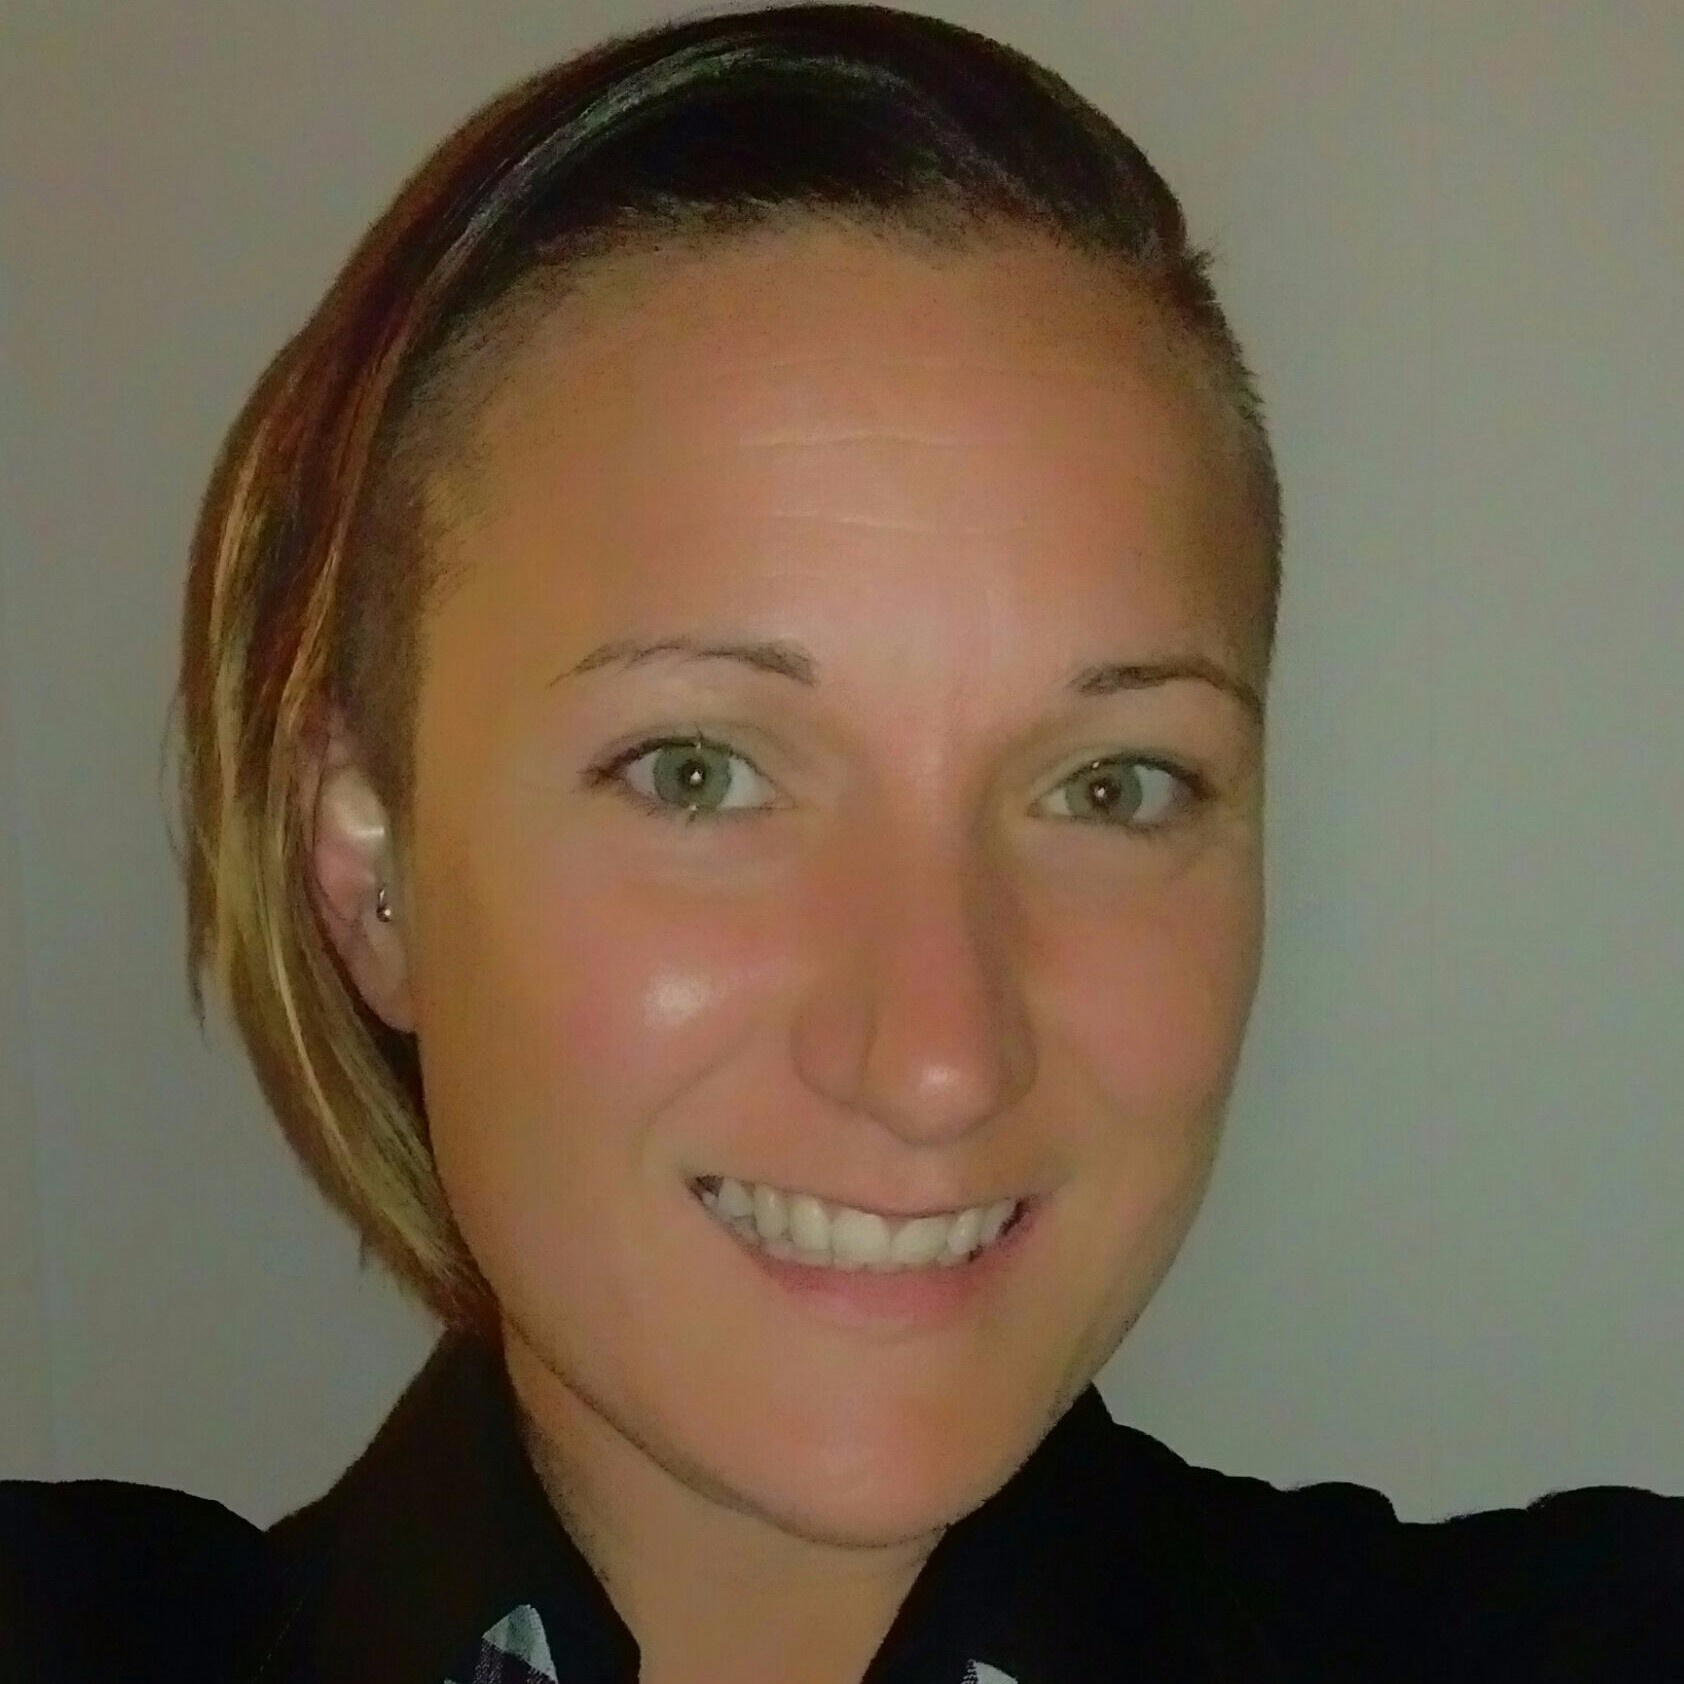 Vicky Baines